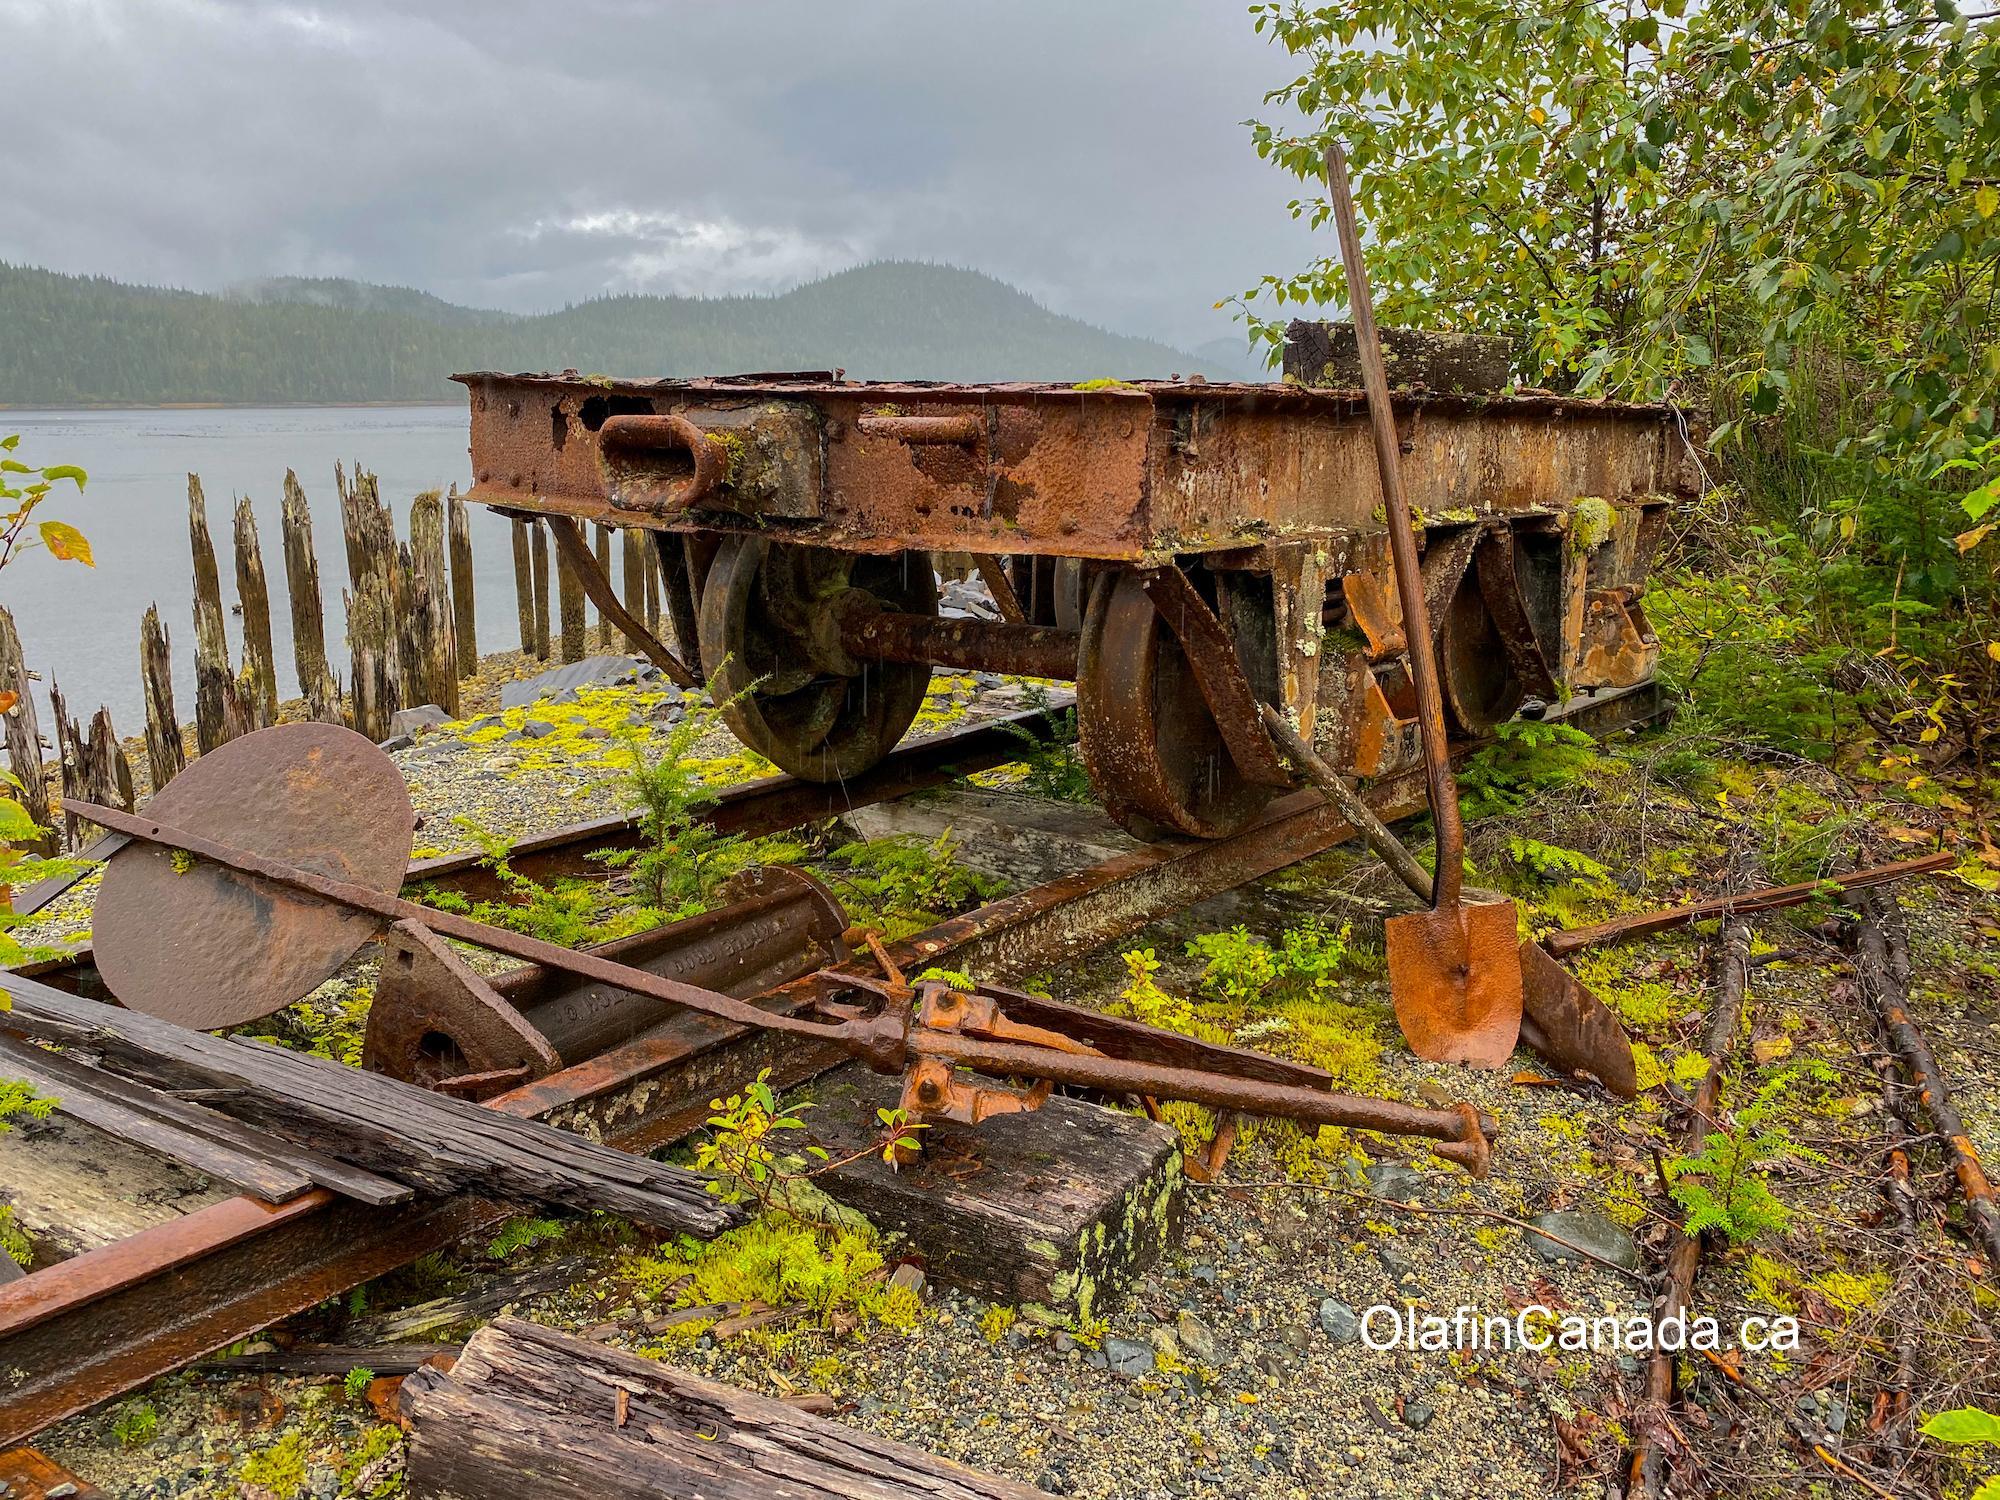 Abandoned rail car in Anyox #olafincanada #britishcolumbia #discoverbc #abandonedbc #anyox